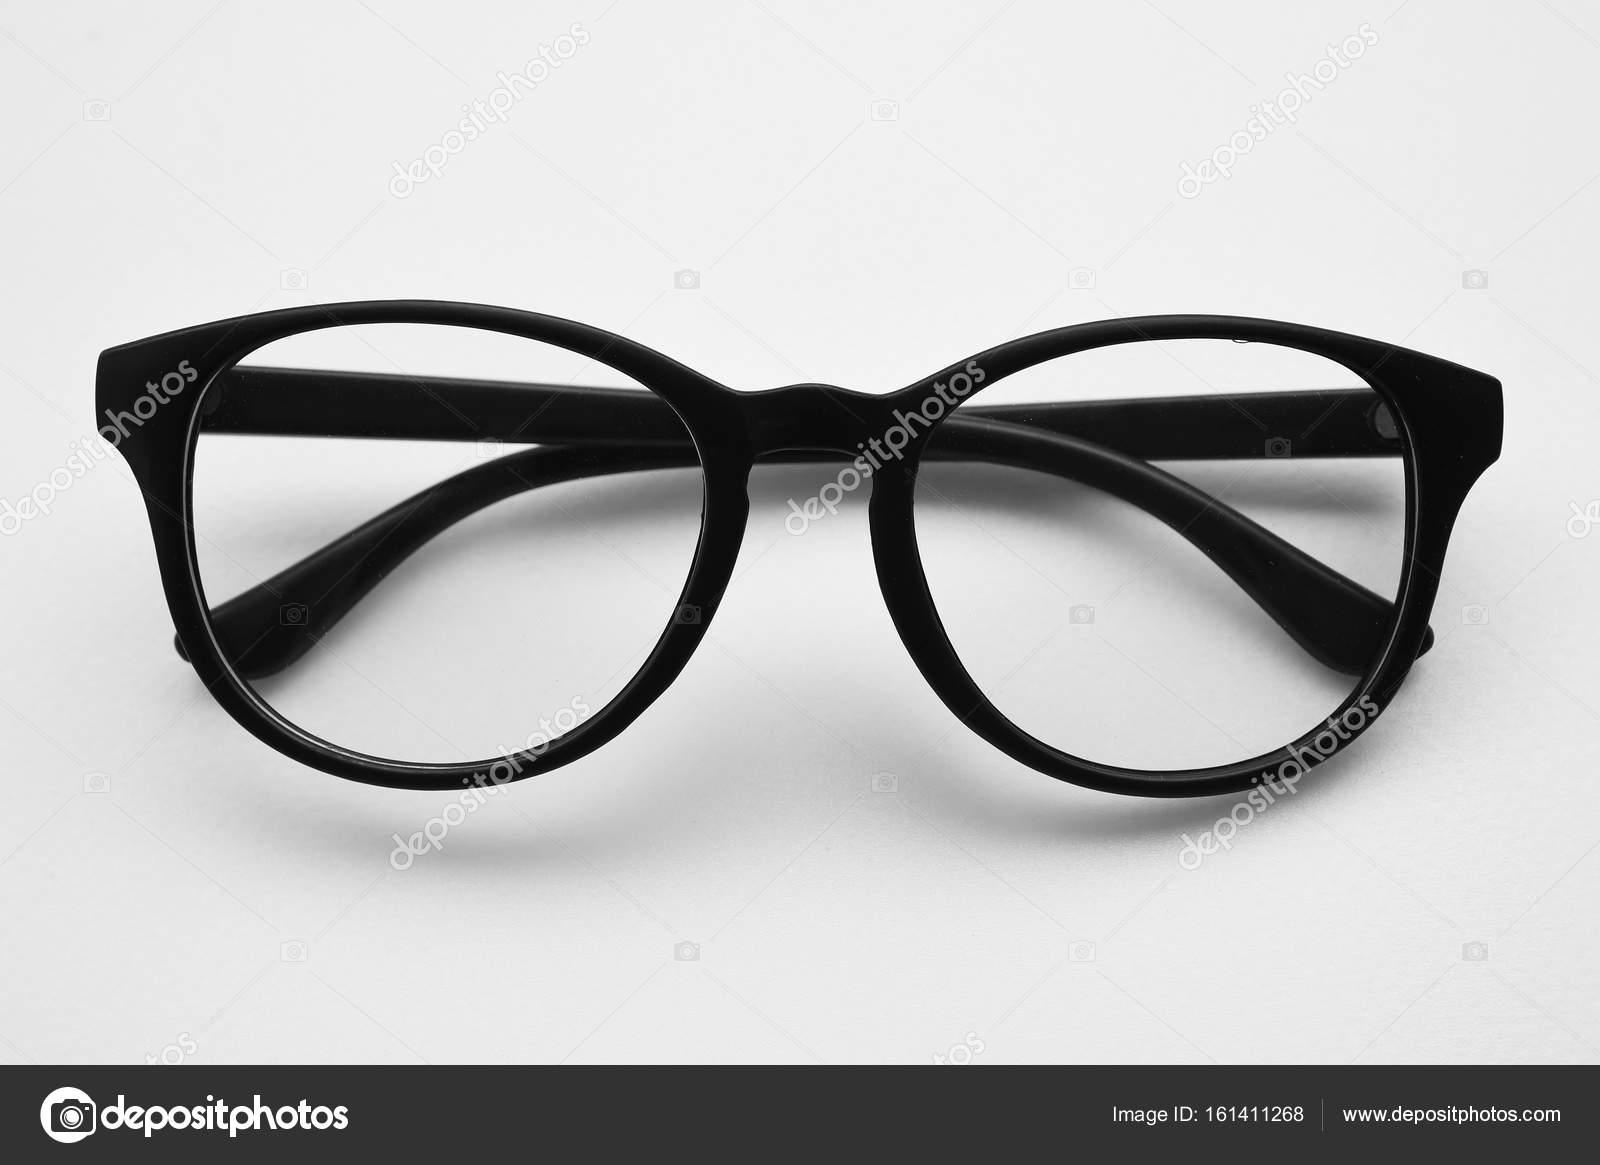 358db09d80 Σύγχρονη μοντέρνα γυαλιά ηλίου που απομονώνονται σε λευκό φόντο — Εικόνα  από aei cei hotmail.com